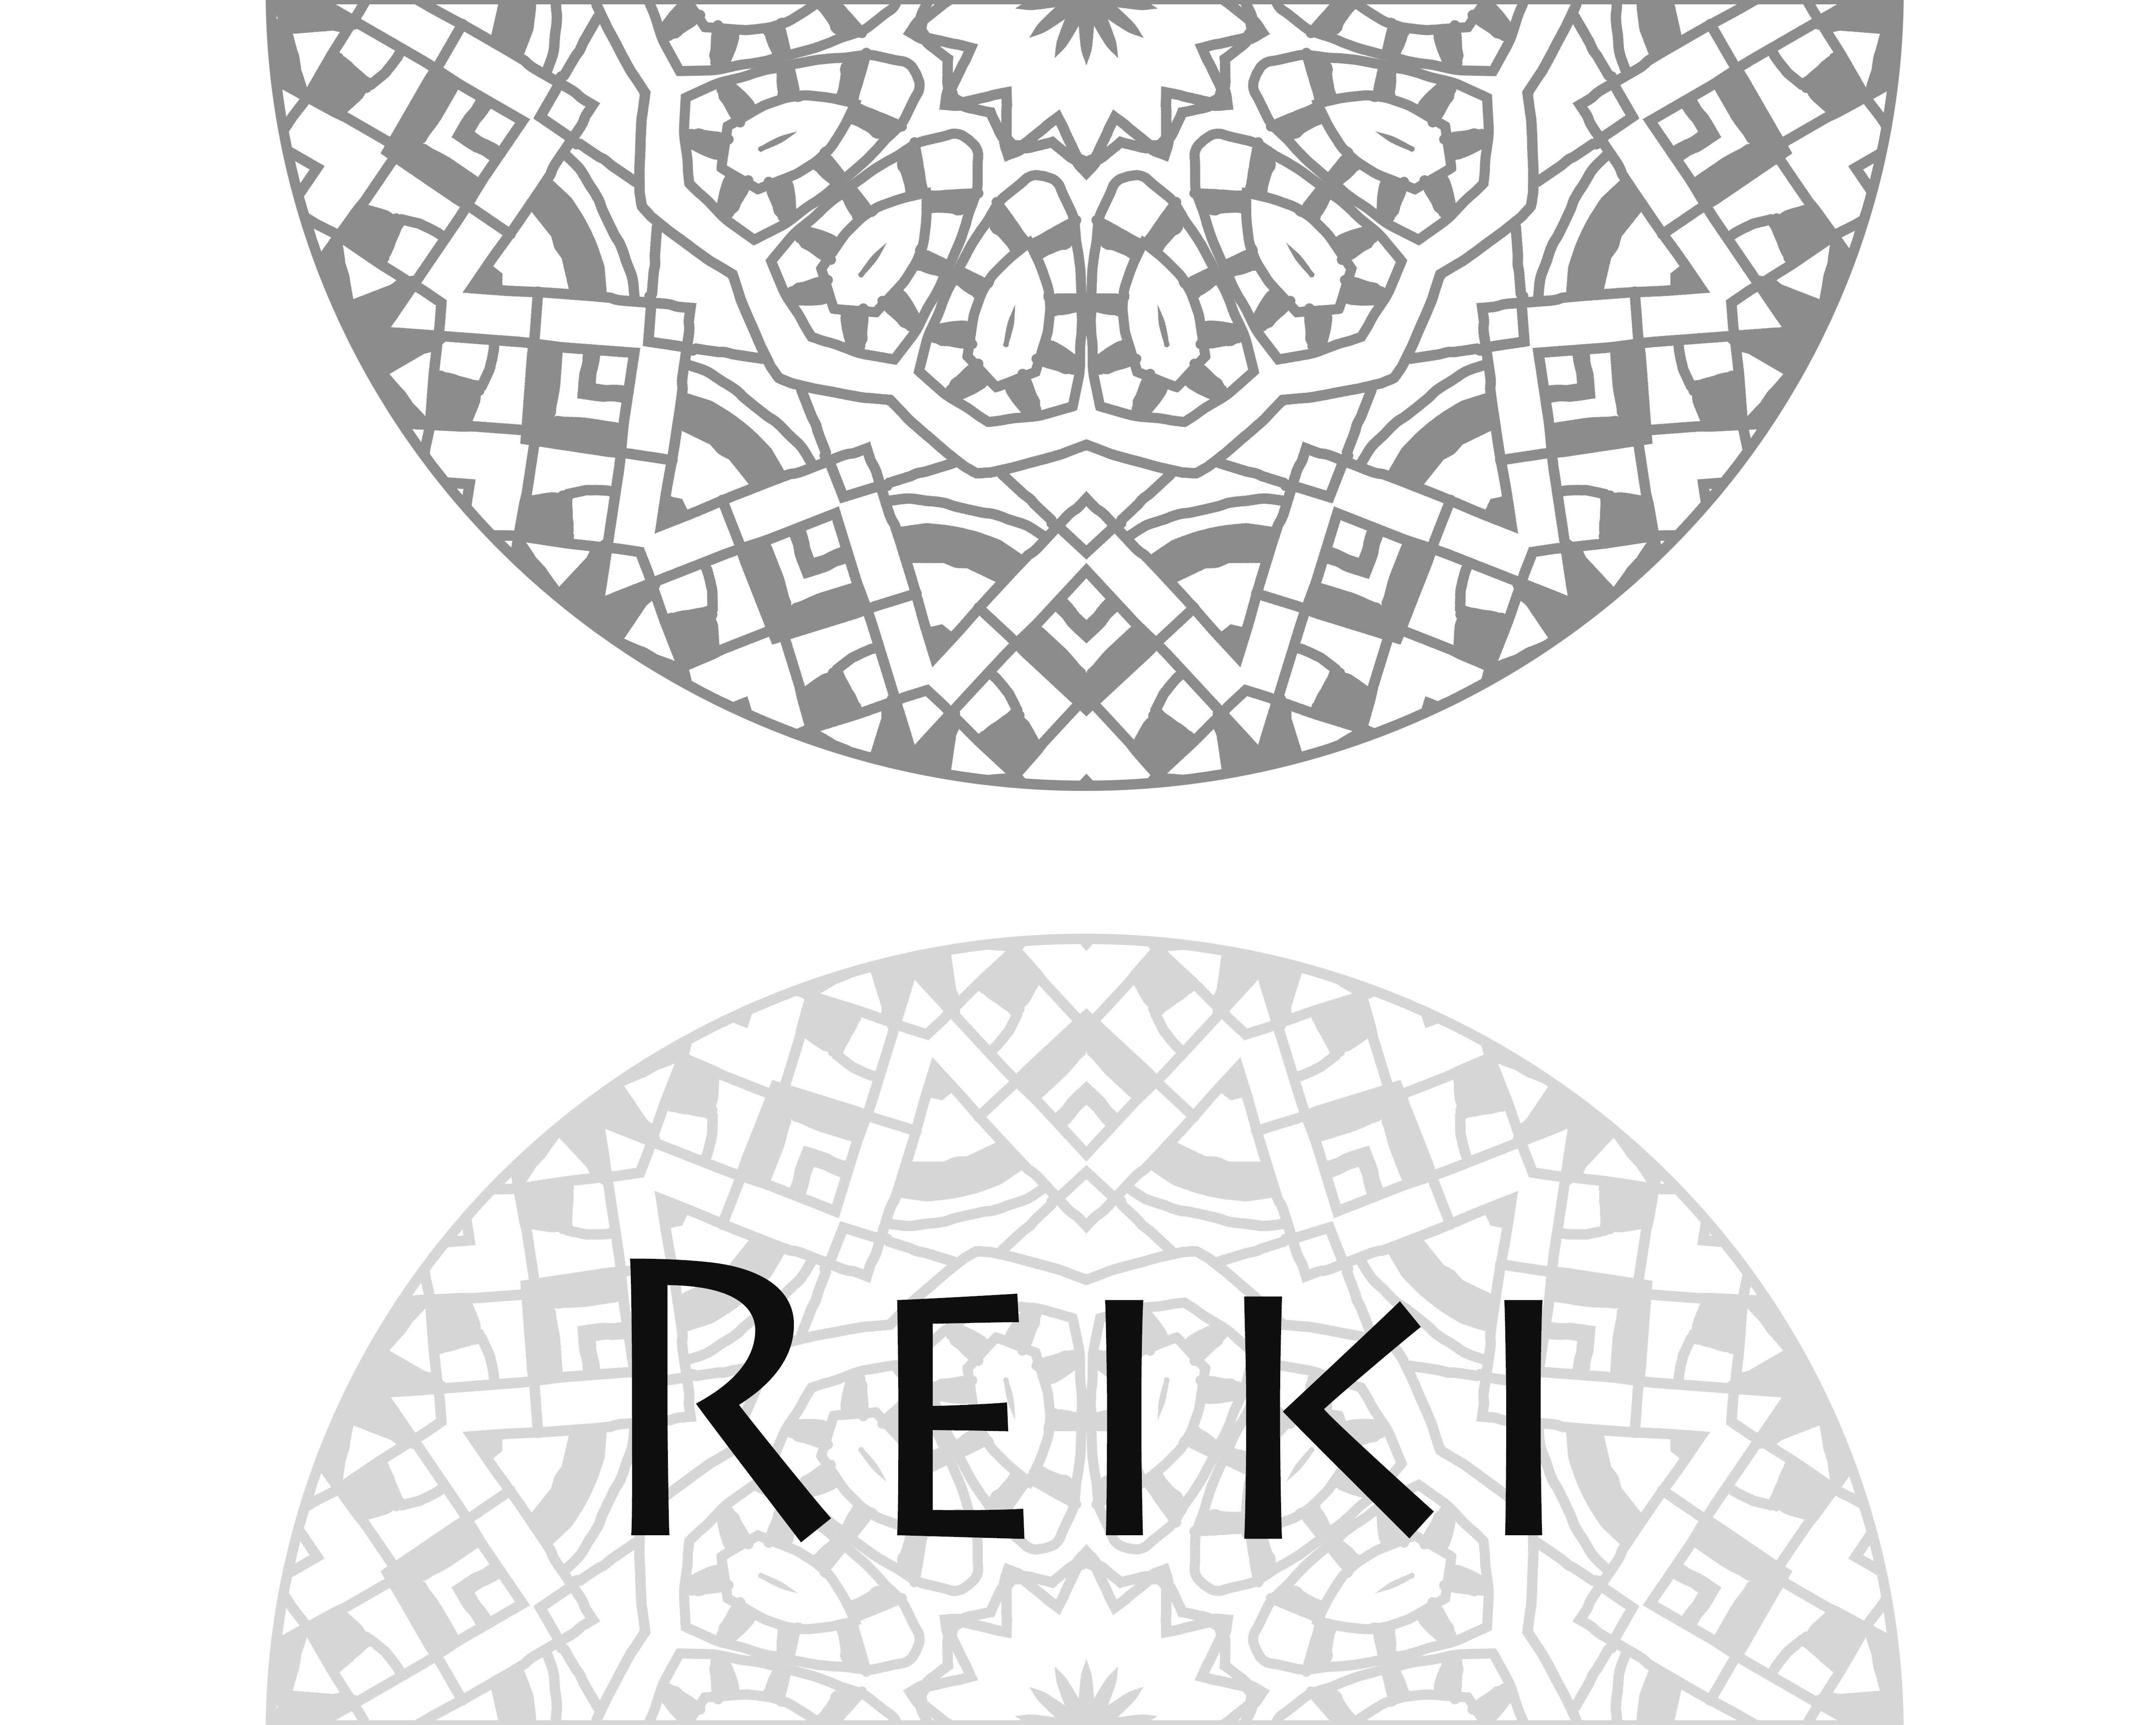 Reiki - Behandlung